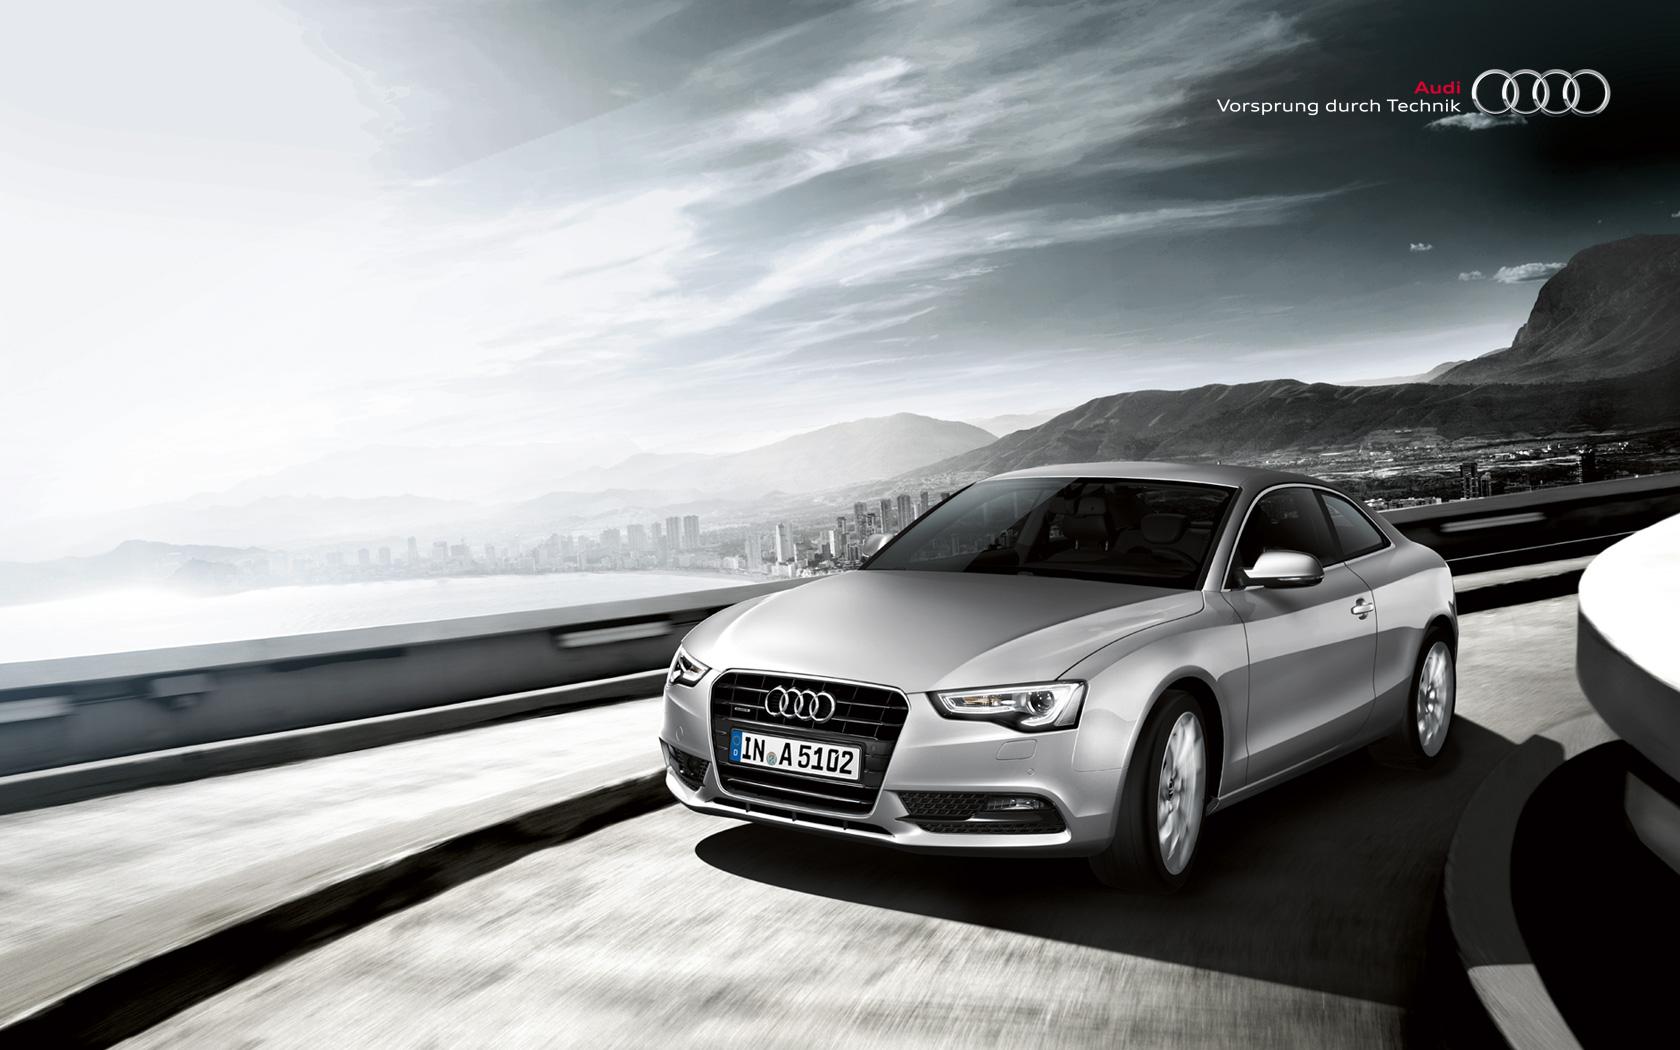 audi wallpaper (Audi A5)